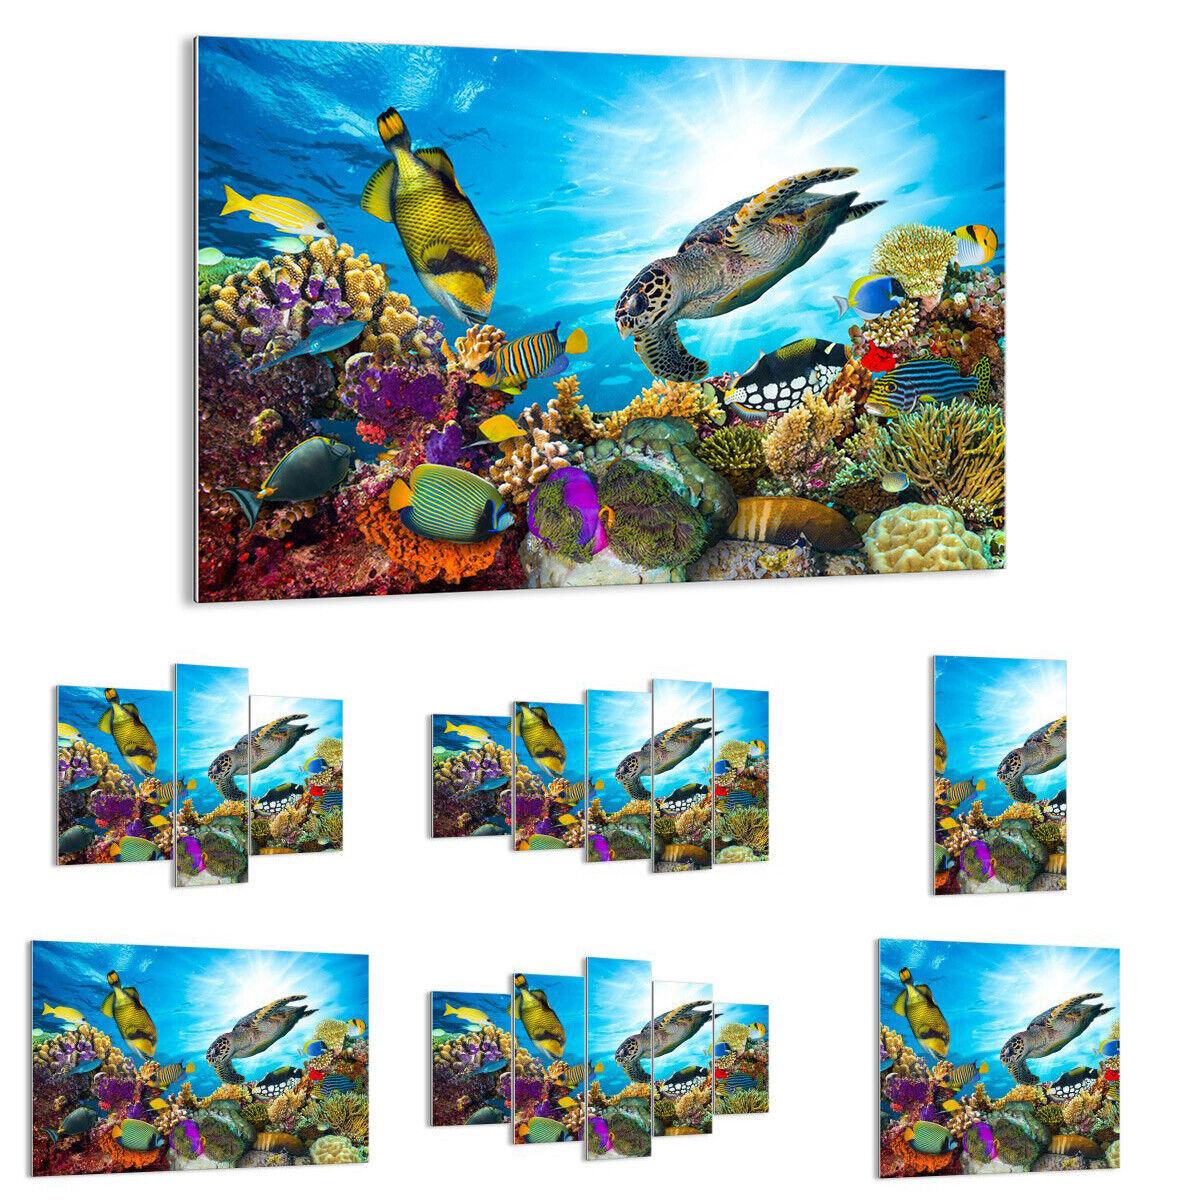 GLASS PRINTS Image Wall Art reef coral fish 3704 UK